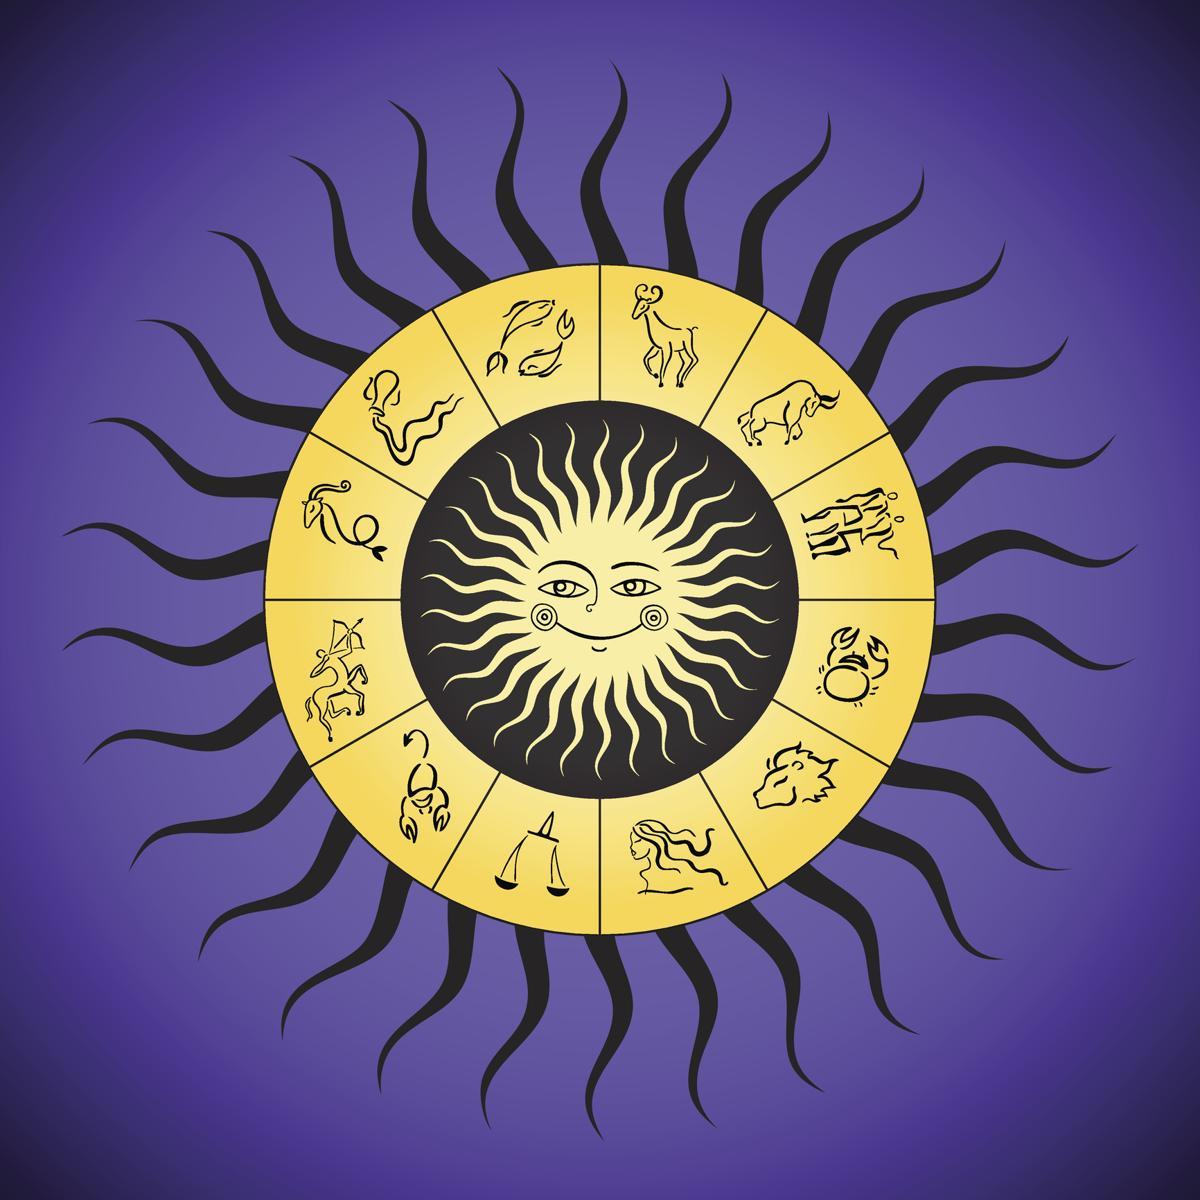 1200-533459284-horoscope-circle-with-zodiac-signs.jpg